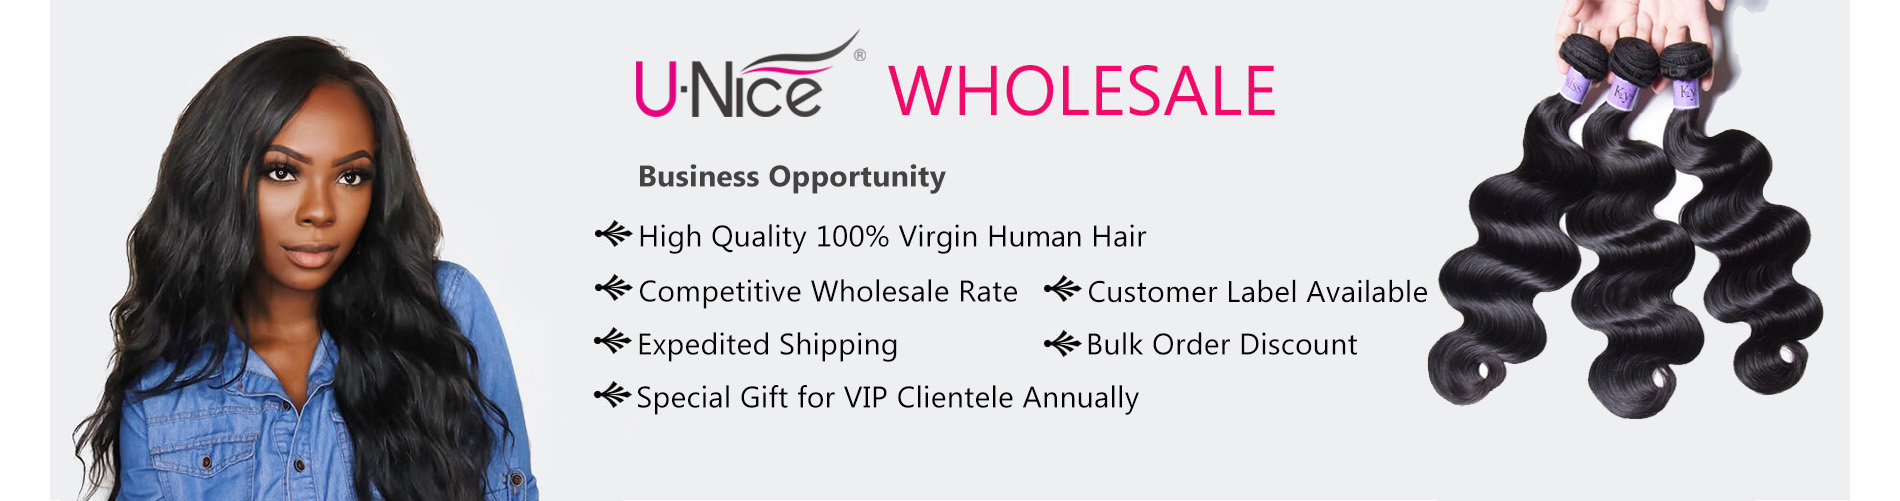 UNice wholesale 100% virgin human hair